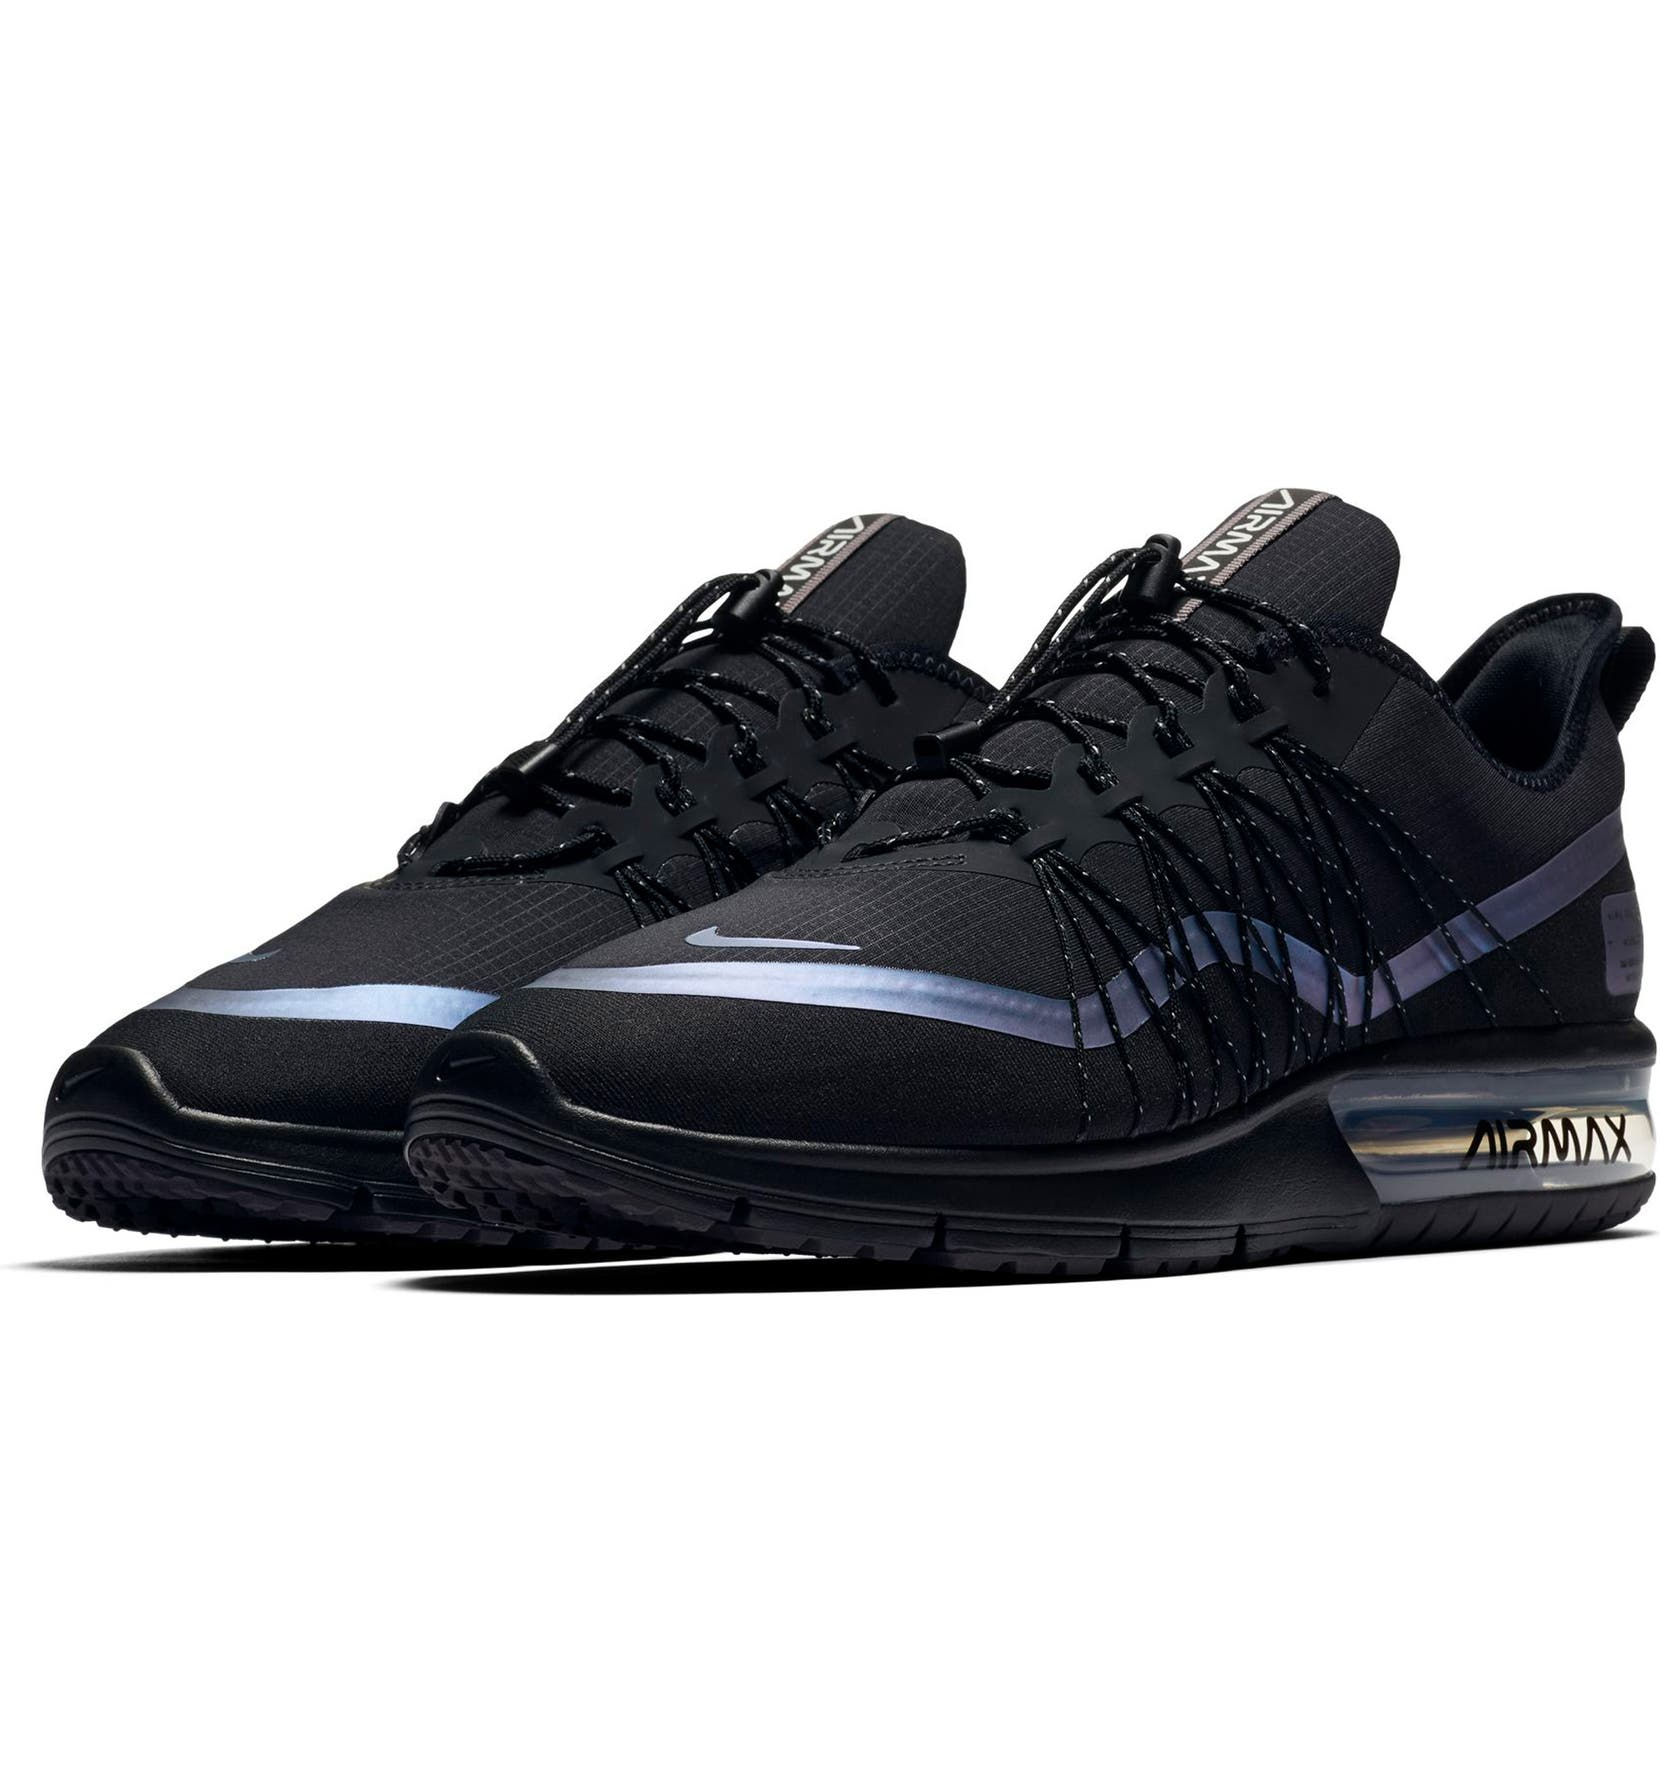 d8440e7b6f385c Nike Air Max Sequent 4 Utility Running Shoe (Men)